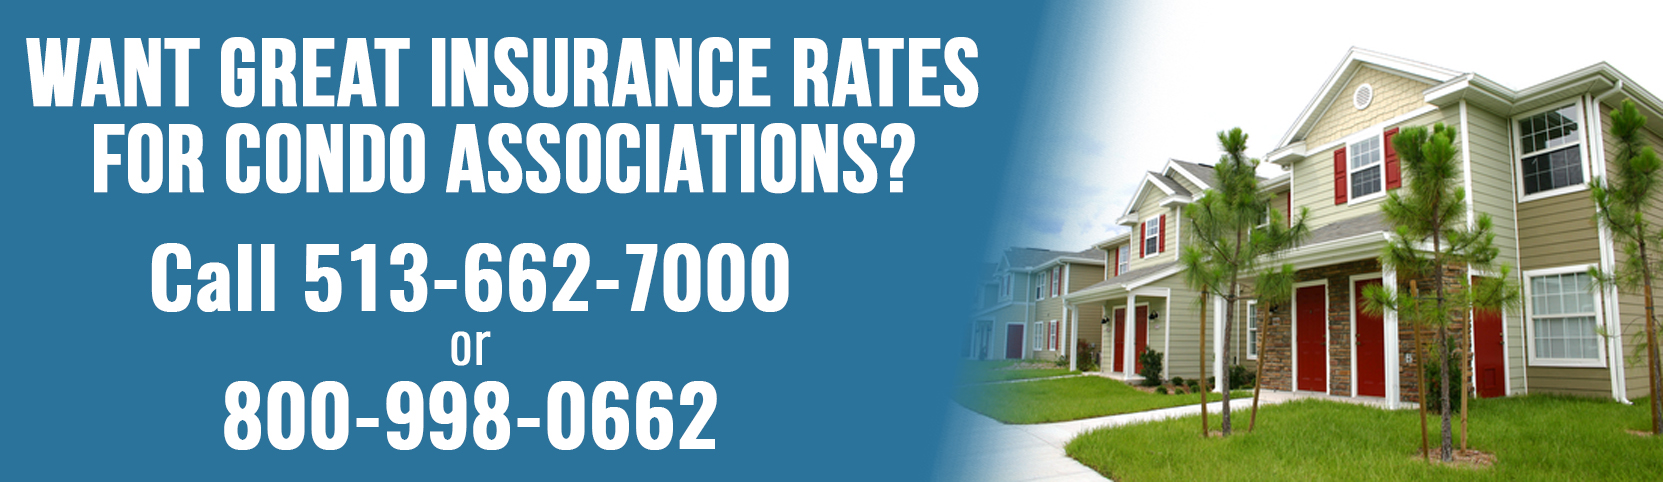 Columbus Condo Insurance